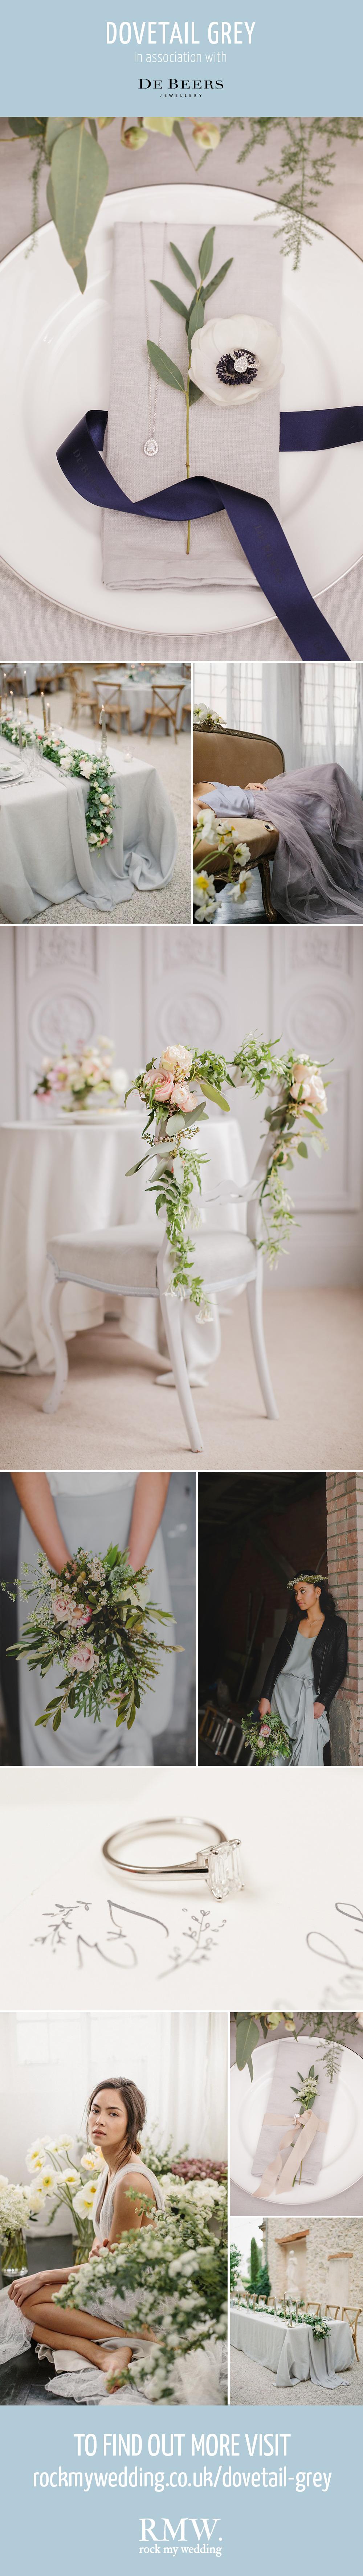 Dovetail Grey Wedding Inspiration